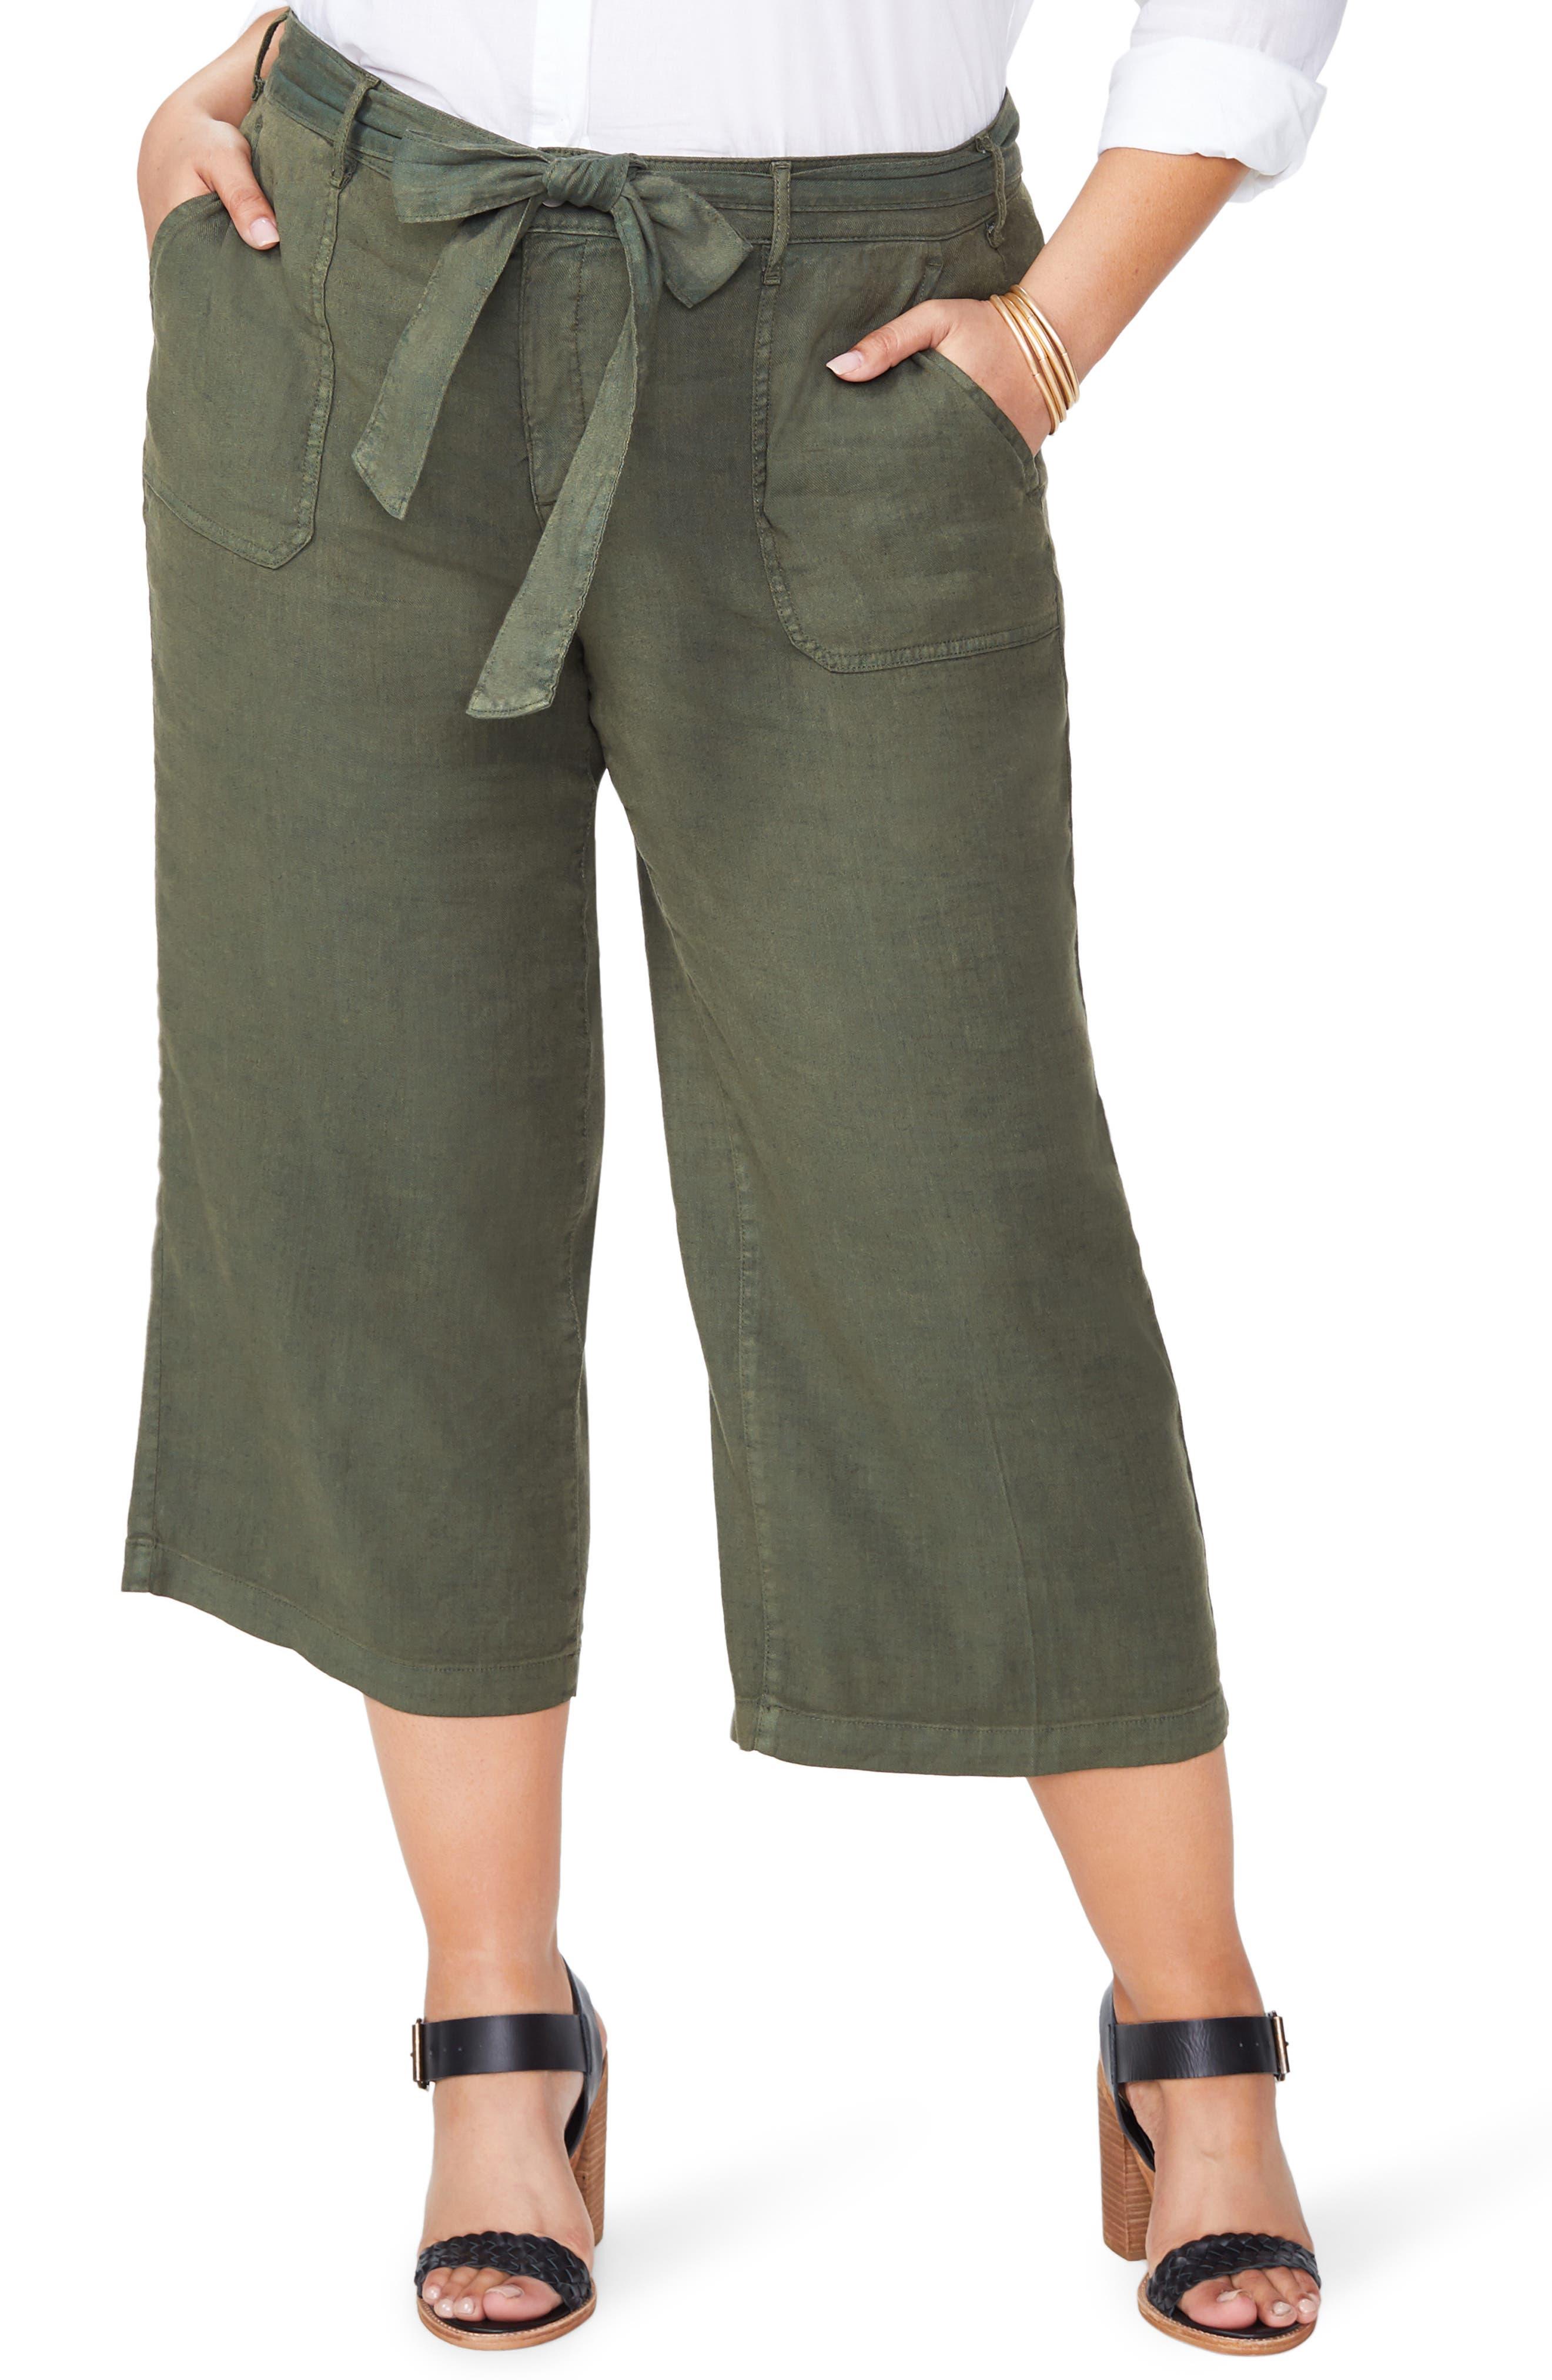 Plus Size Nydj Fashion Cargo Capri Pants, Green